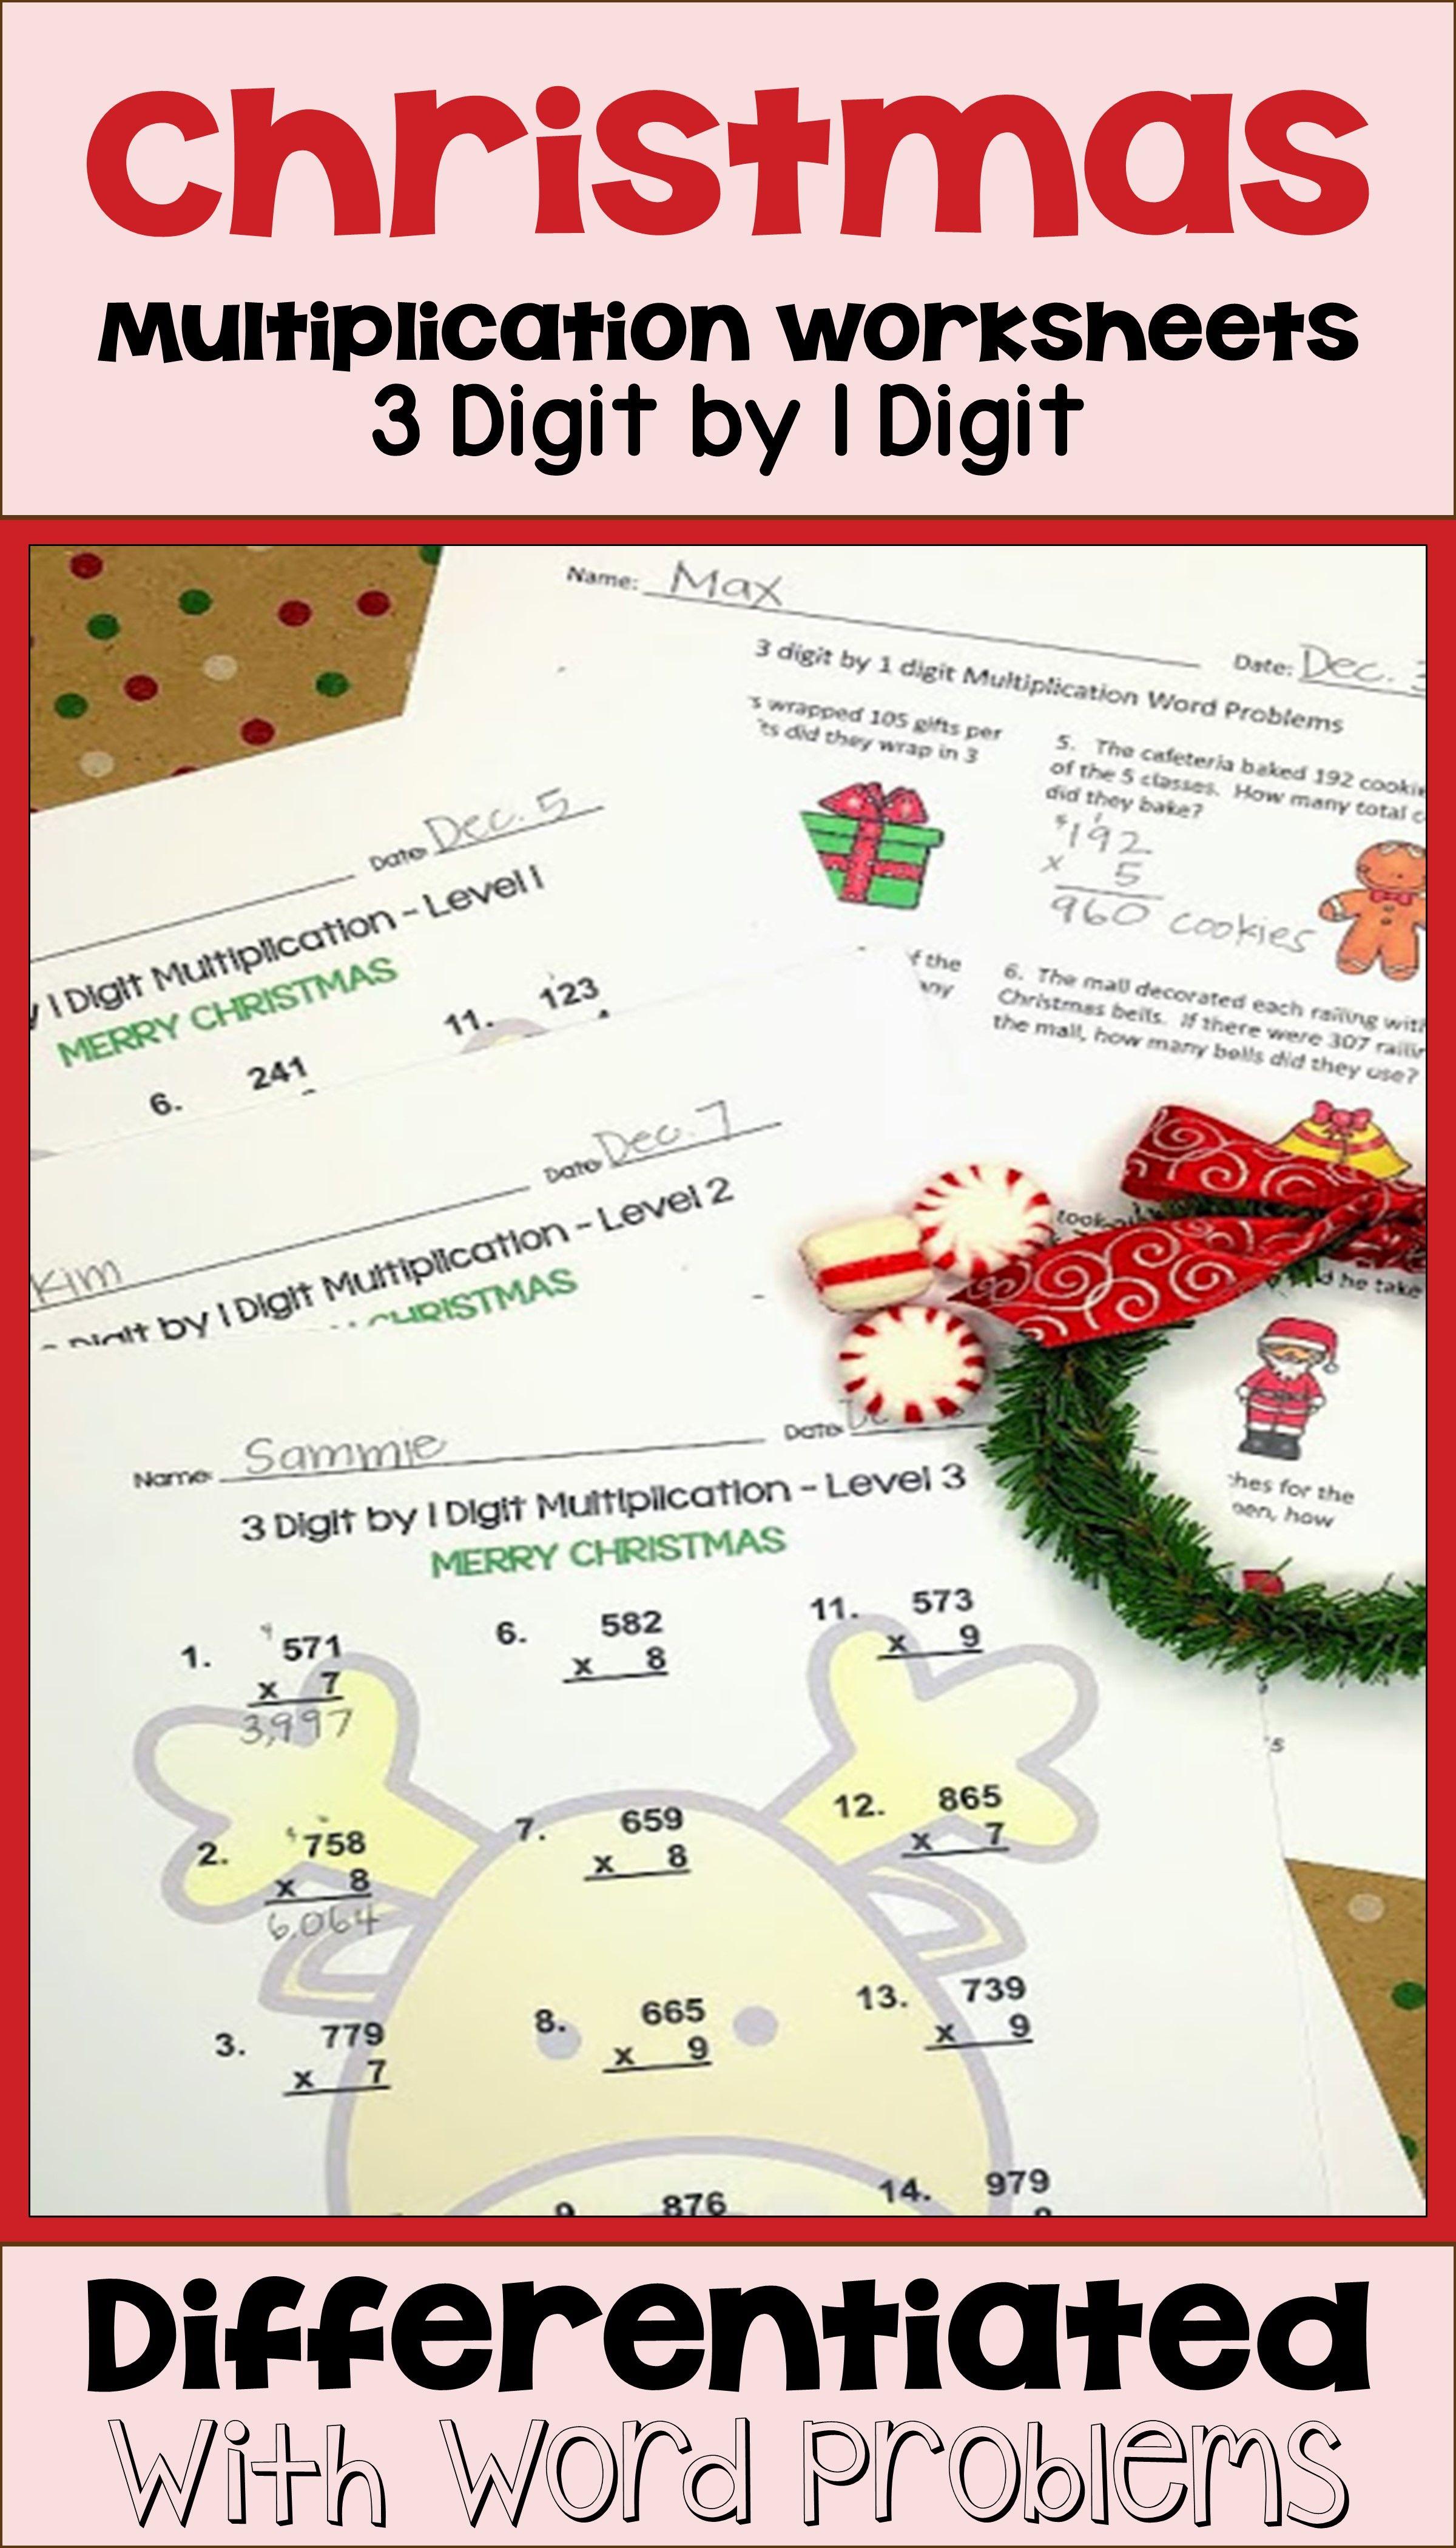 Christmas 3 Digit By 1 Digit Multiplication Worksheets Printable And Digital In 2020 Christmas Multiplication Worksheets Differentiation Math Math Centers